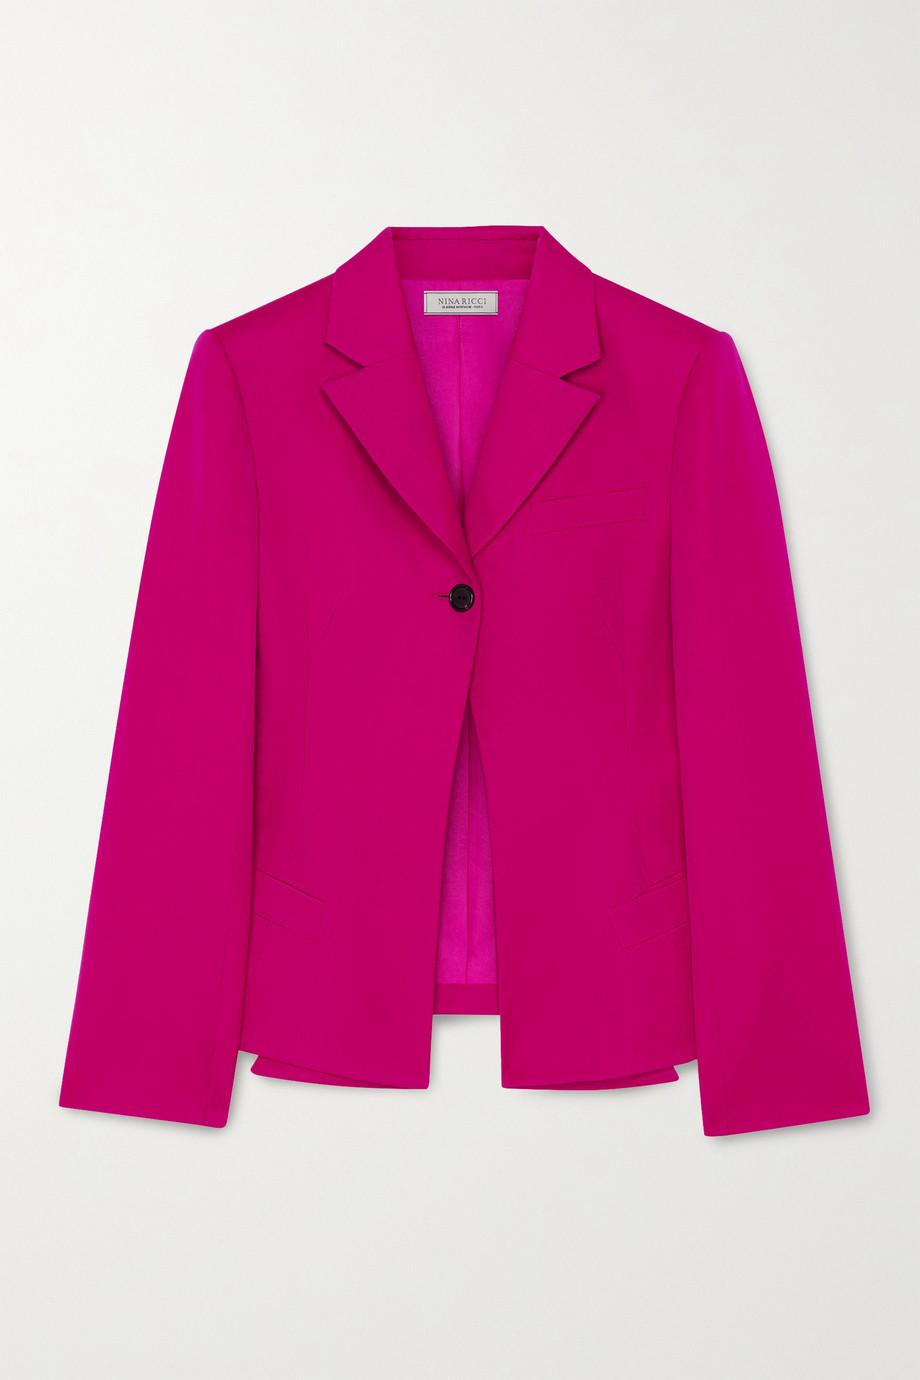 Nina Ricci Wool-gabardine blazer